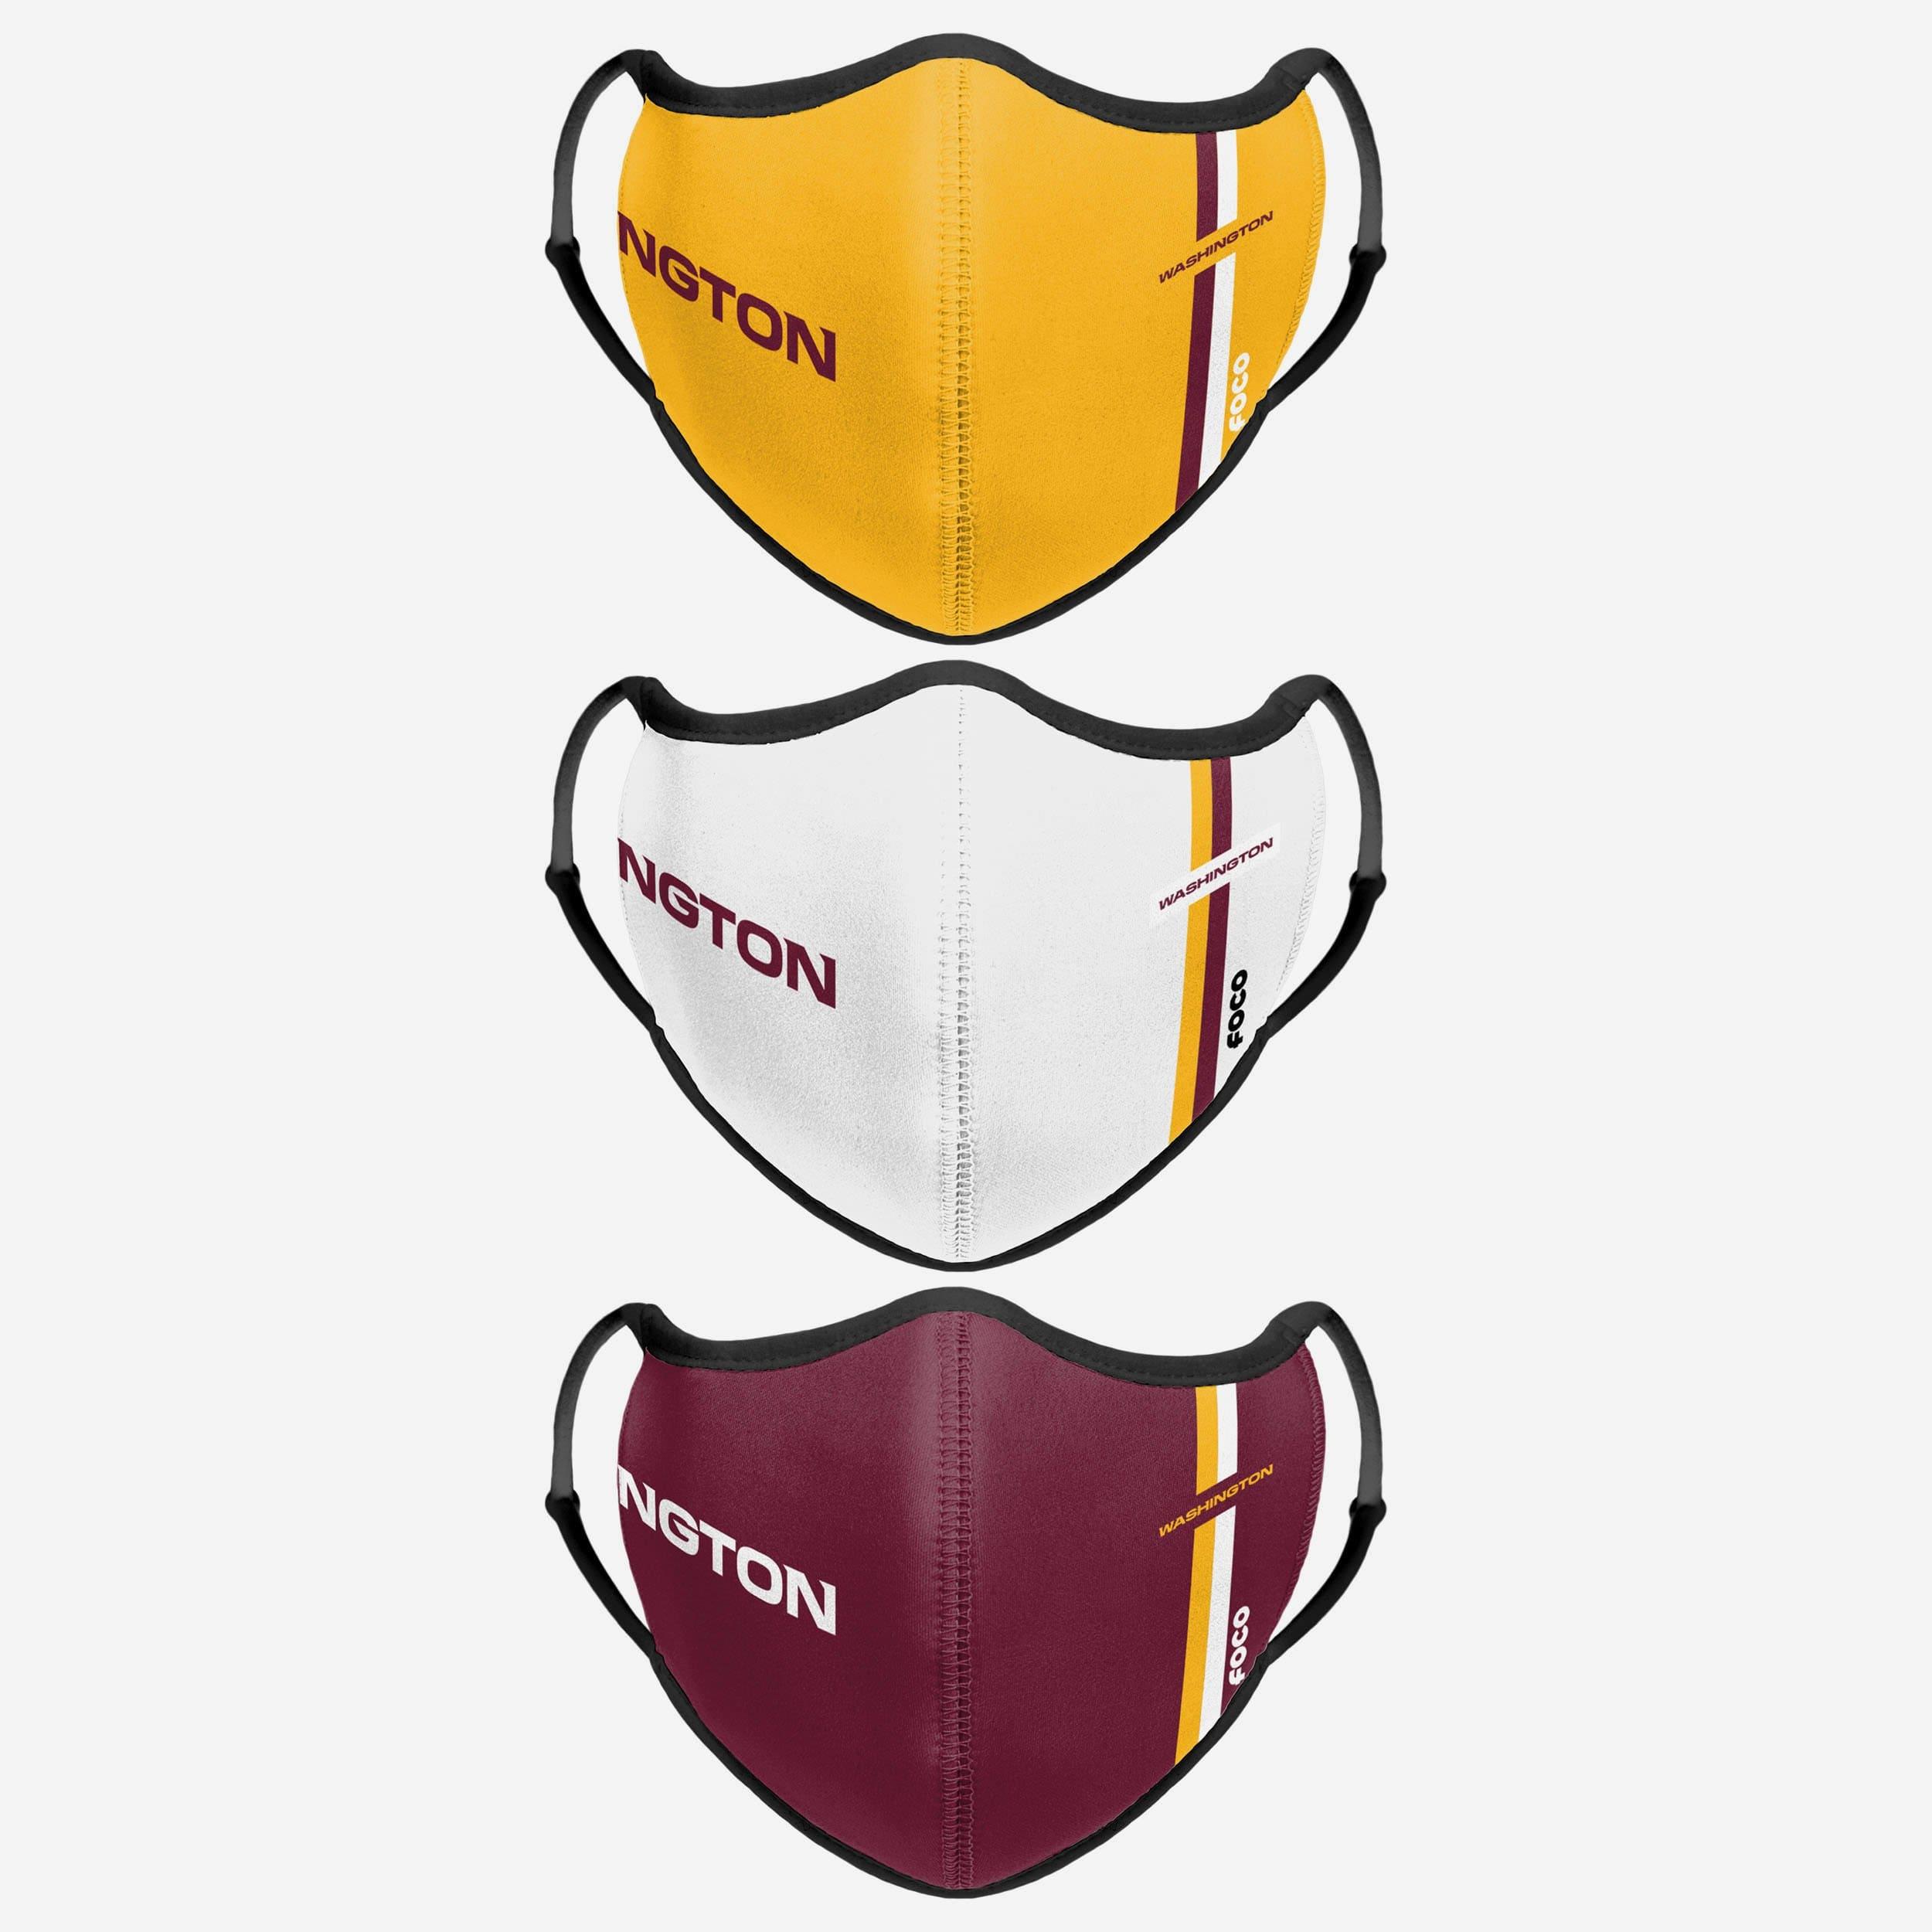 FOCO Washington Football Team Sport 3 Pack Face Cover